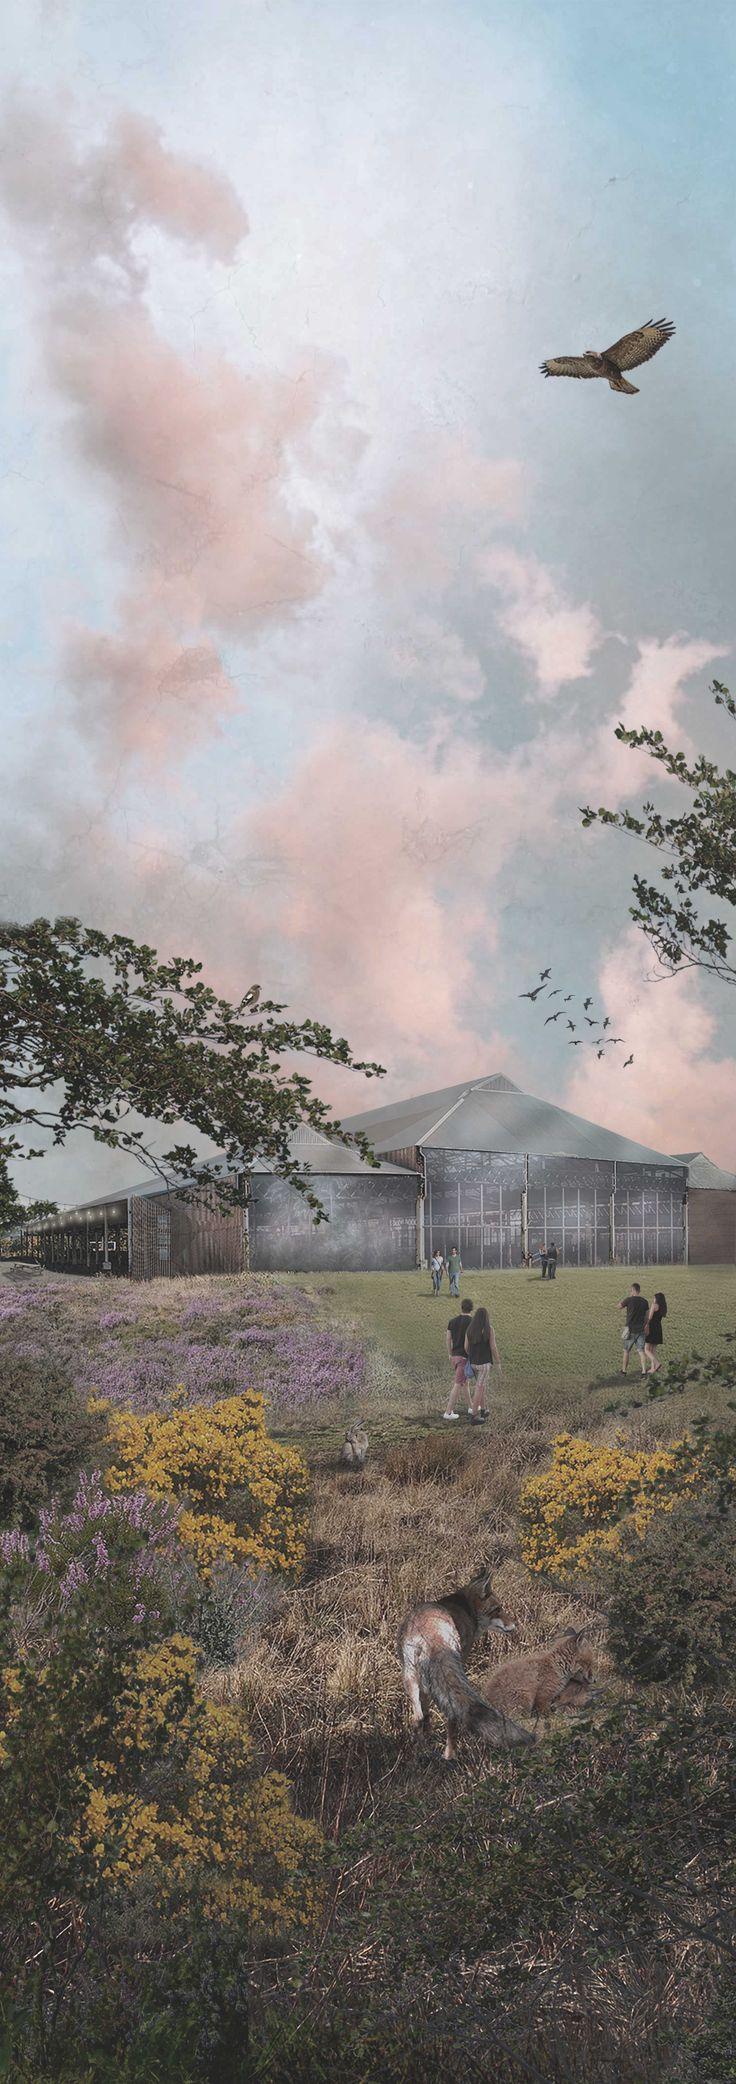 MSc Landscape Architecture - Edinburgh College of Art - Final Year Project Abattoir Park Visual, by Meg Johannessen